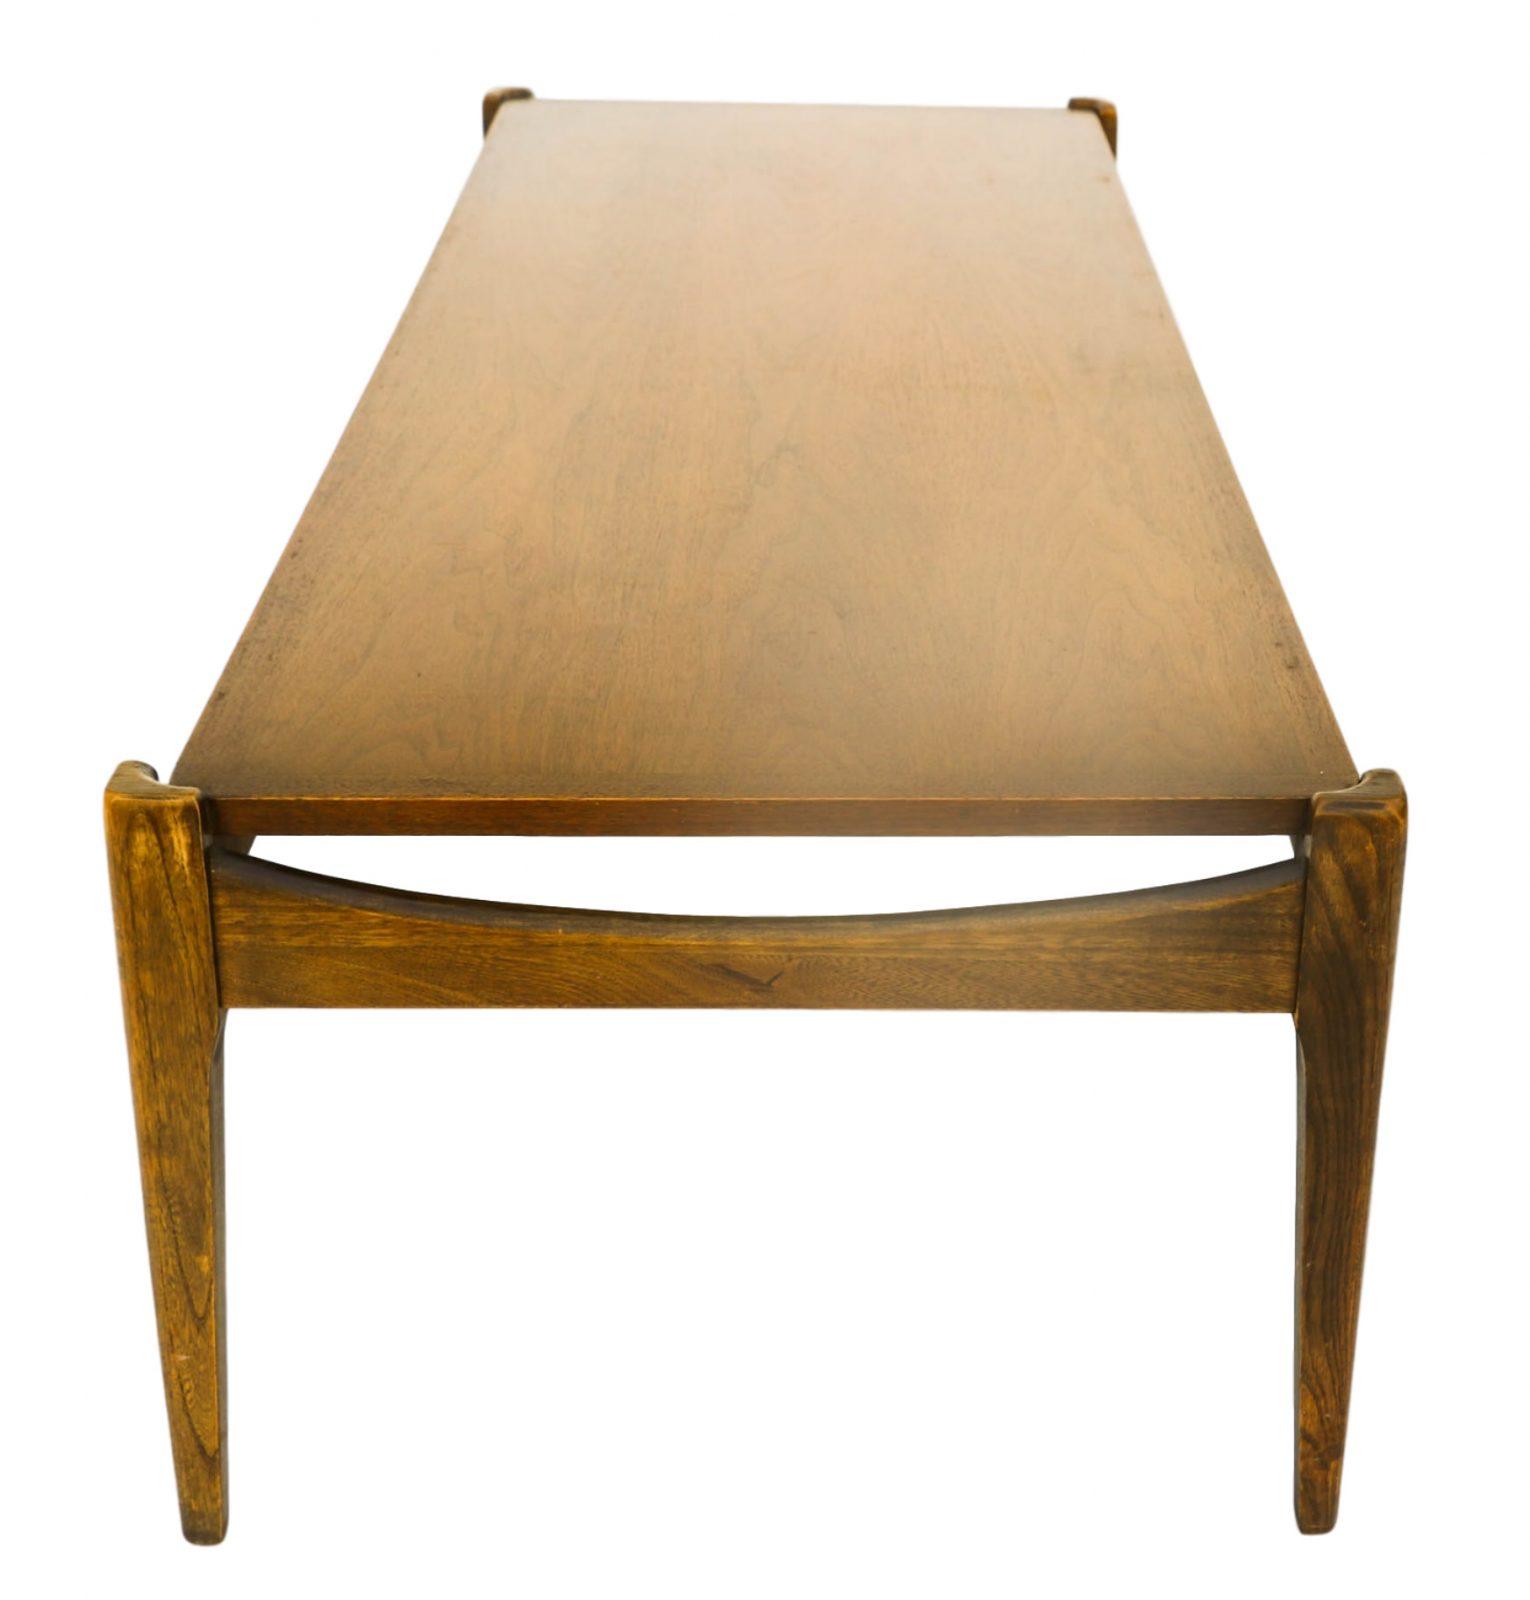 Bassett Walnut Surfboard Coffee Table: Mid-Century Modern Bassett Walnut Coffee Table